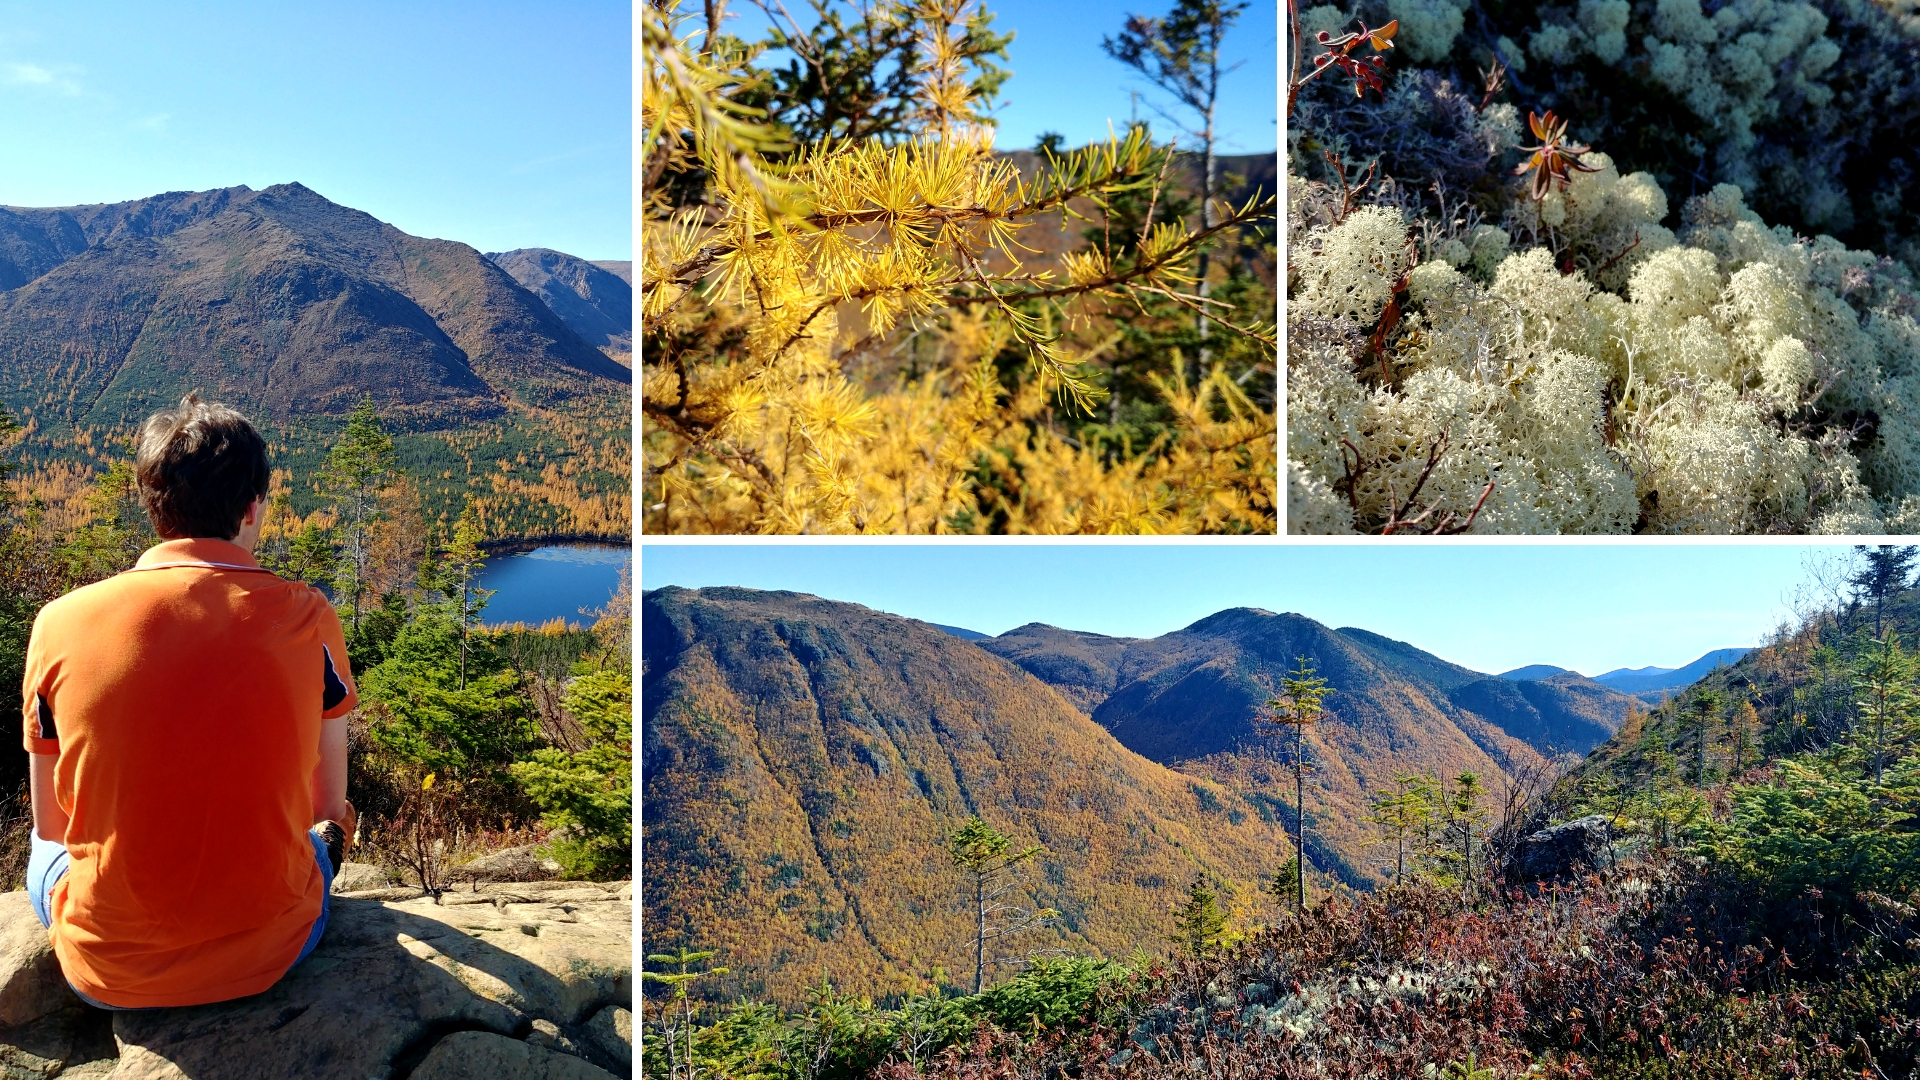 mont olivine parc national gaspesie automne blog voyage canada road-trip arpenter le chemin